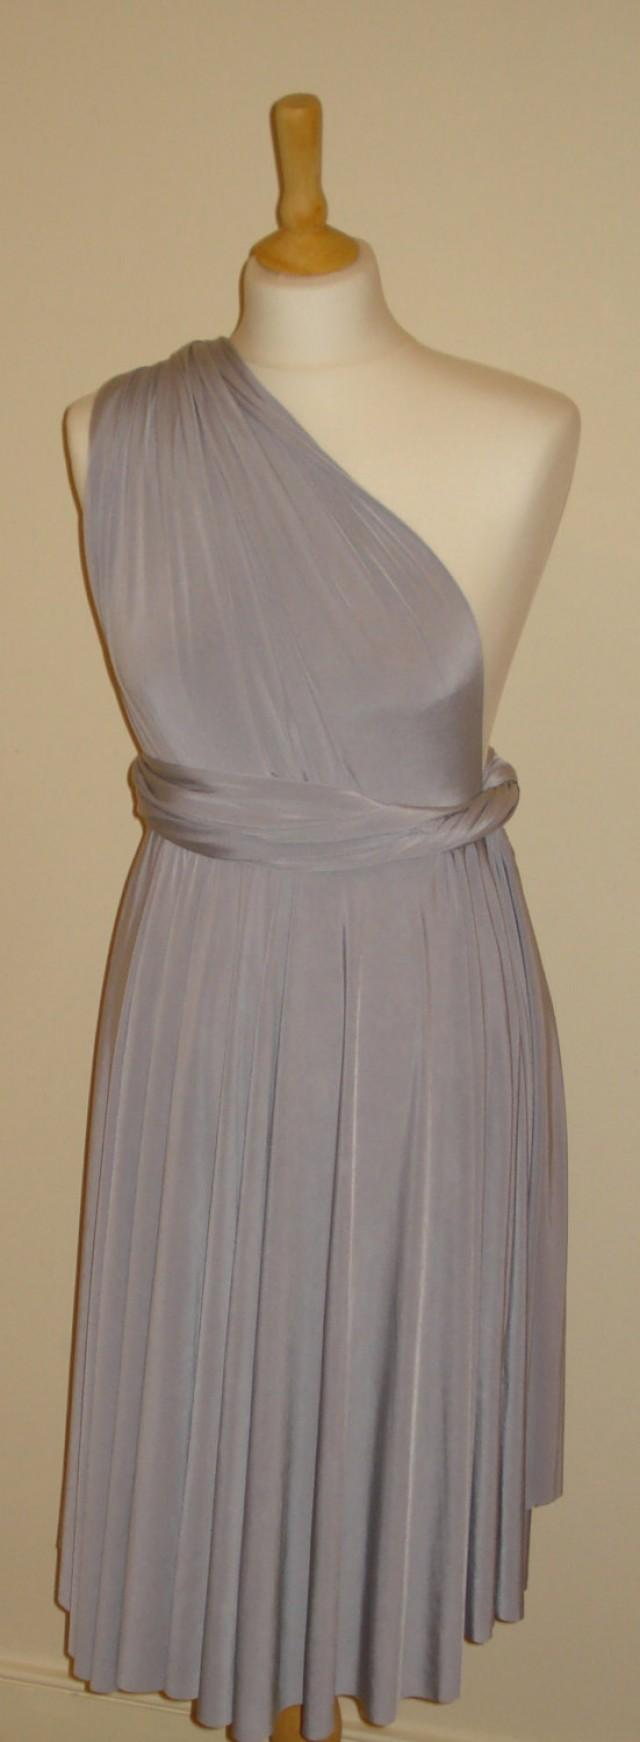 2019 Short Prom Dresses and Short Formal Dresses